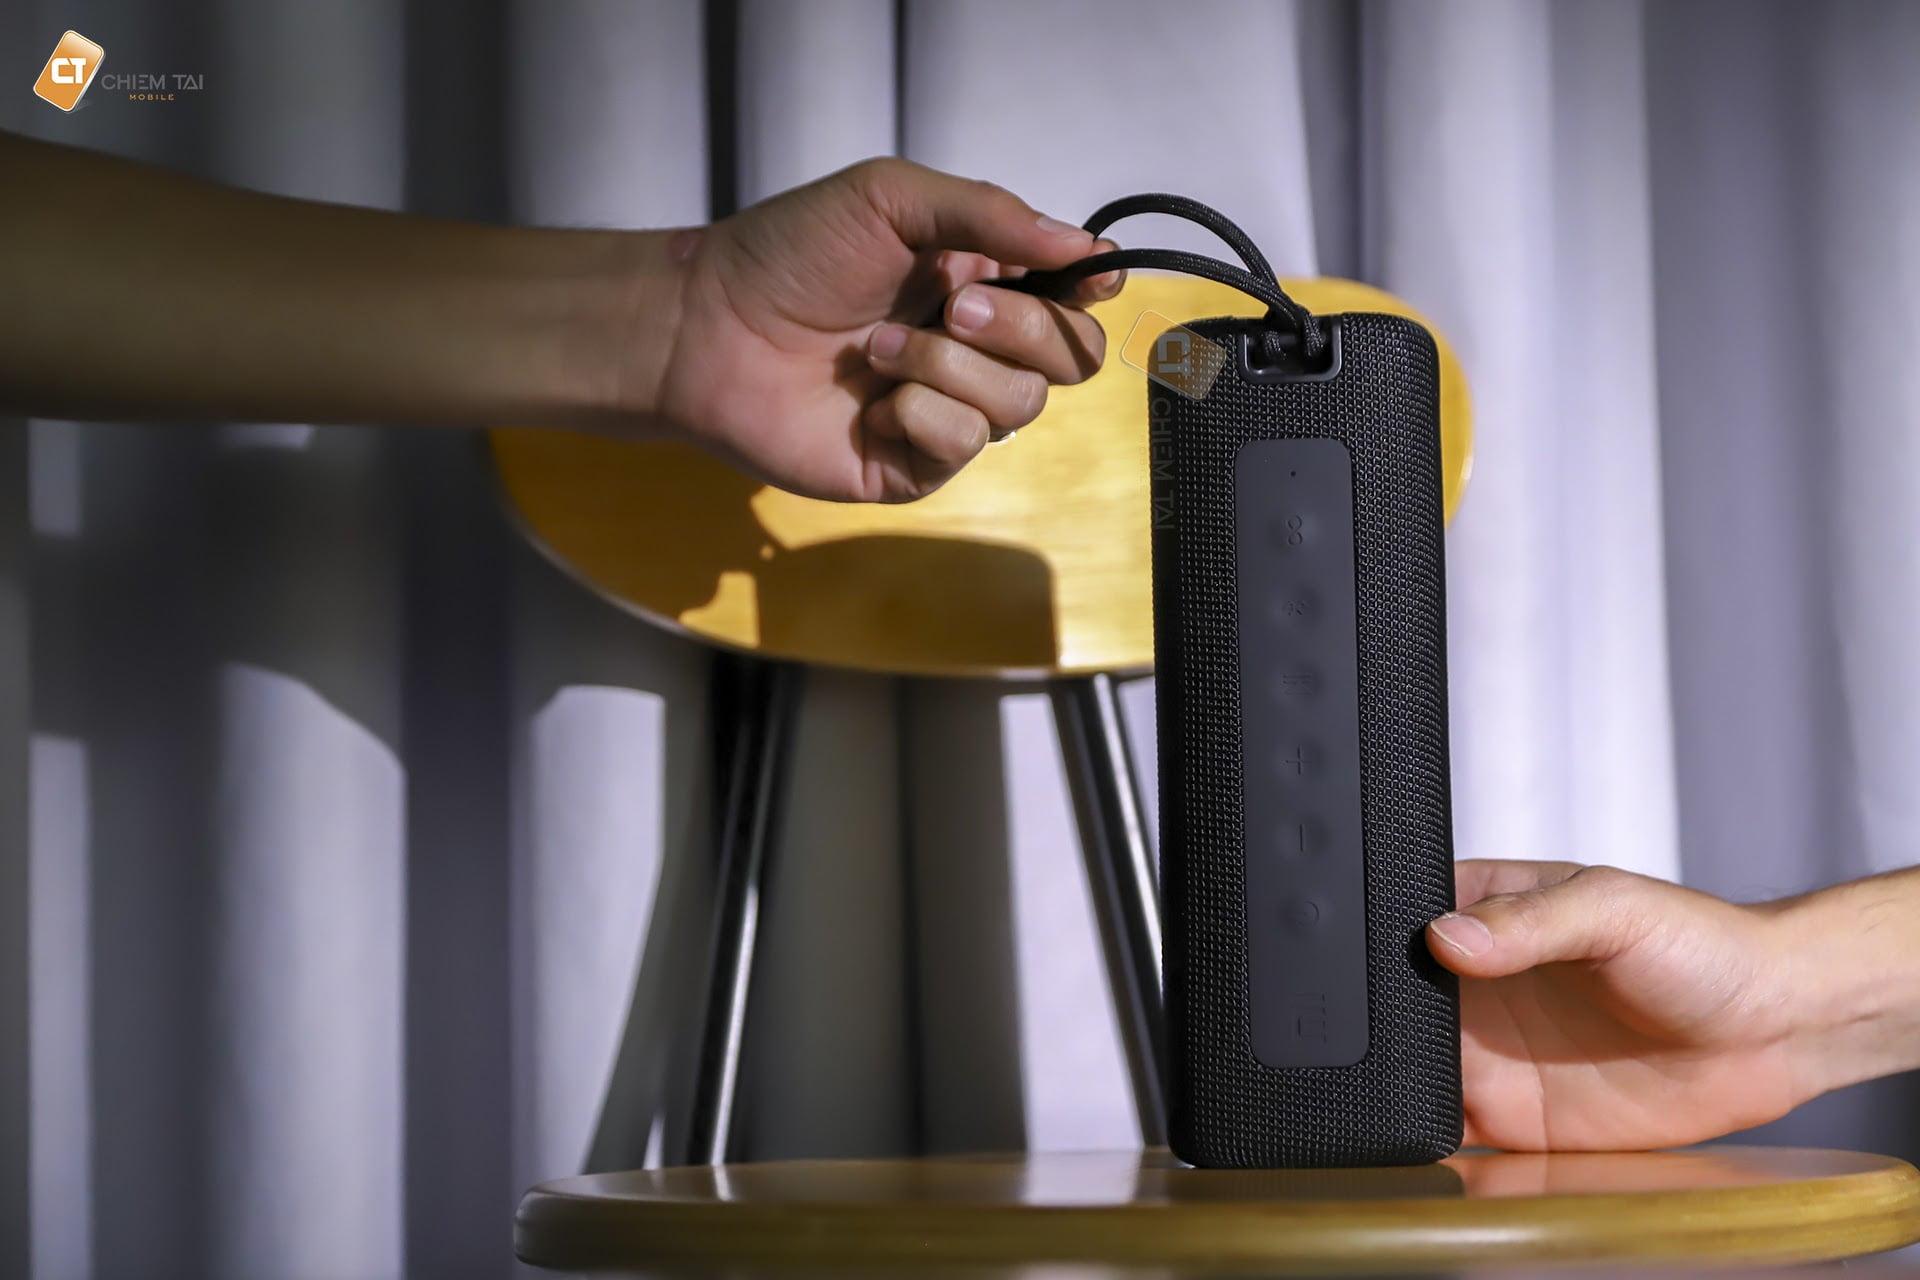 loa bluetooth outdoor xiaomi portable speaker 16w mdz 36 db 605d91d7ea232